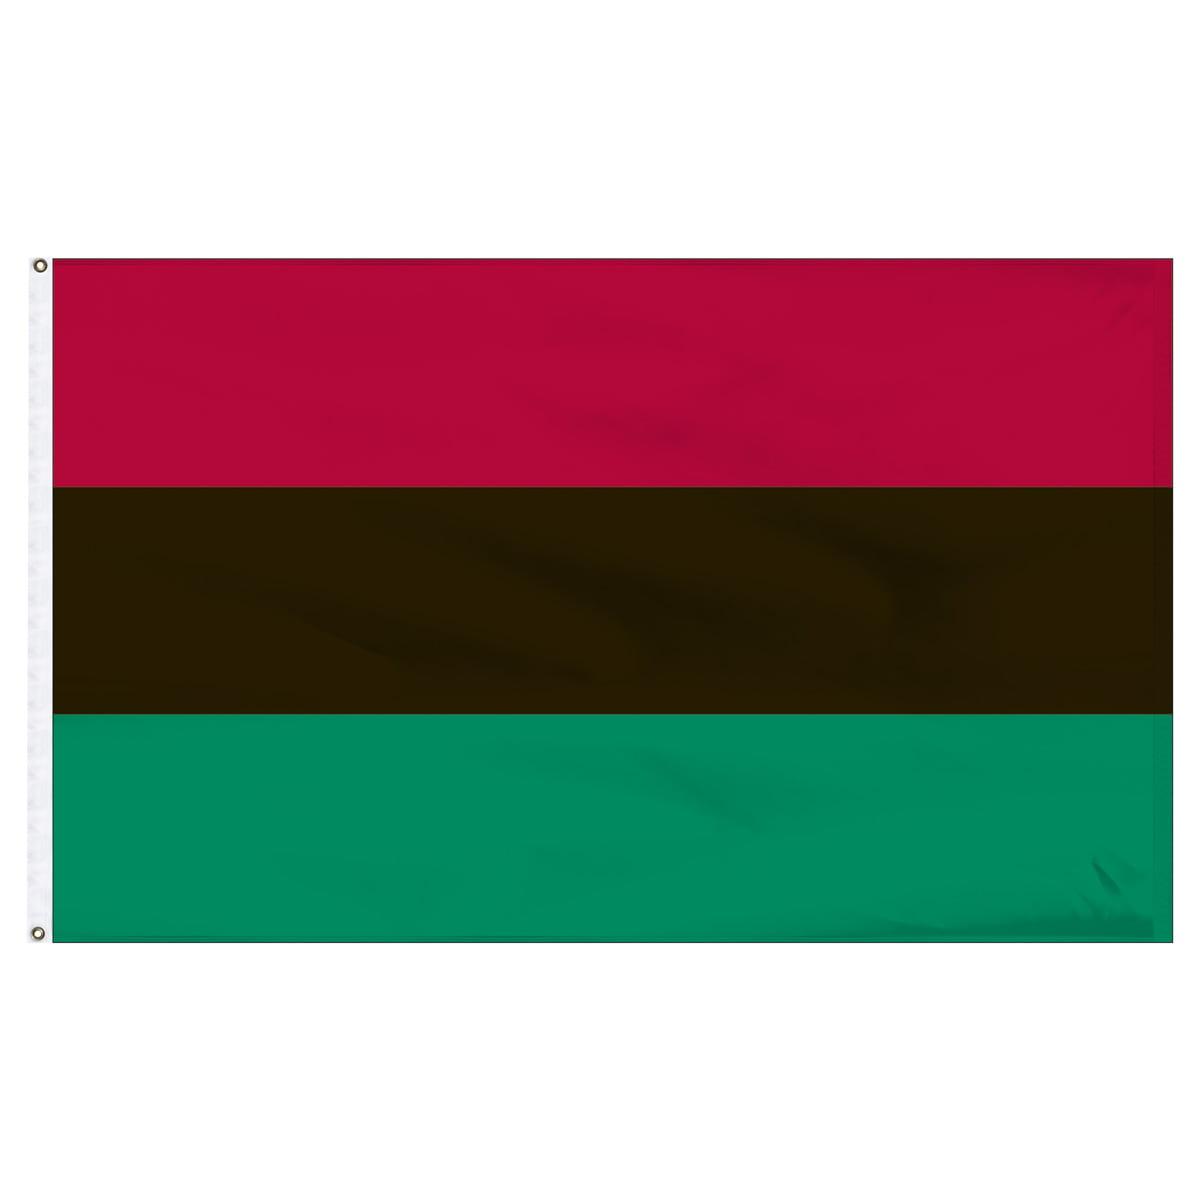 African American Flag 3x5 feet Nylon